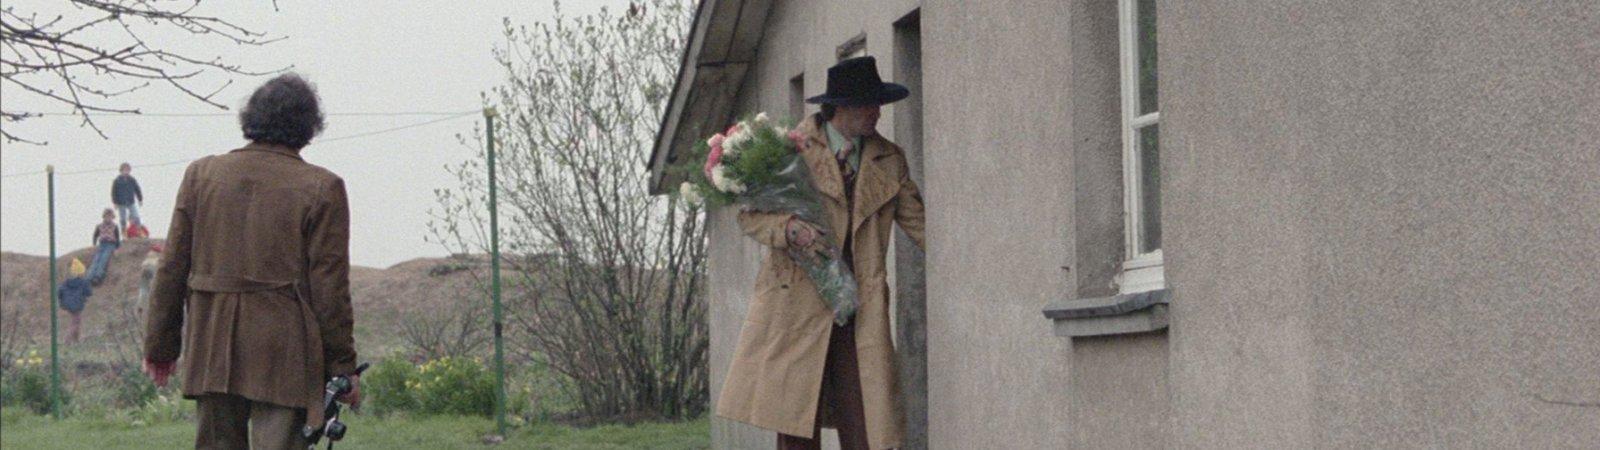 Photo du film : L'honneur perdu de katharina blum